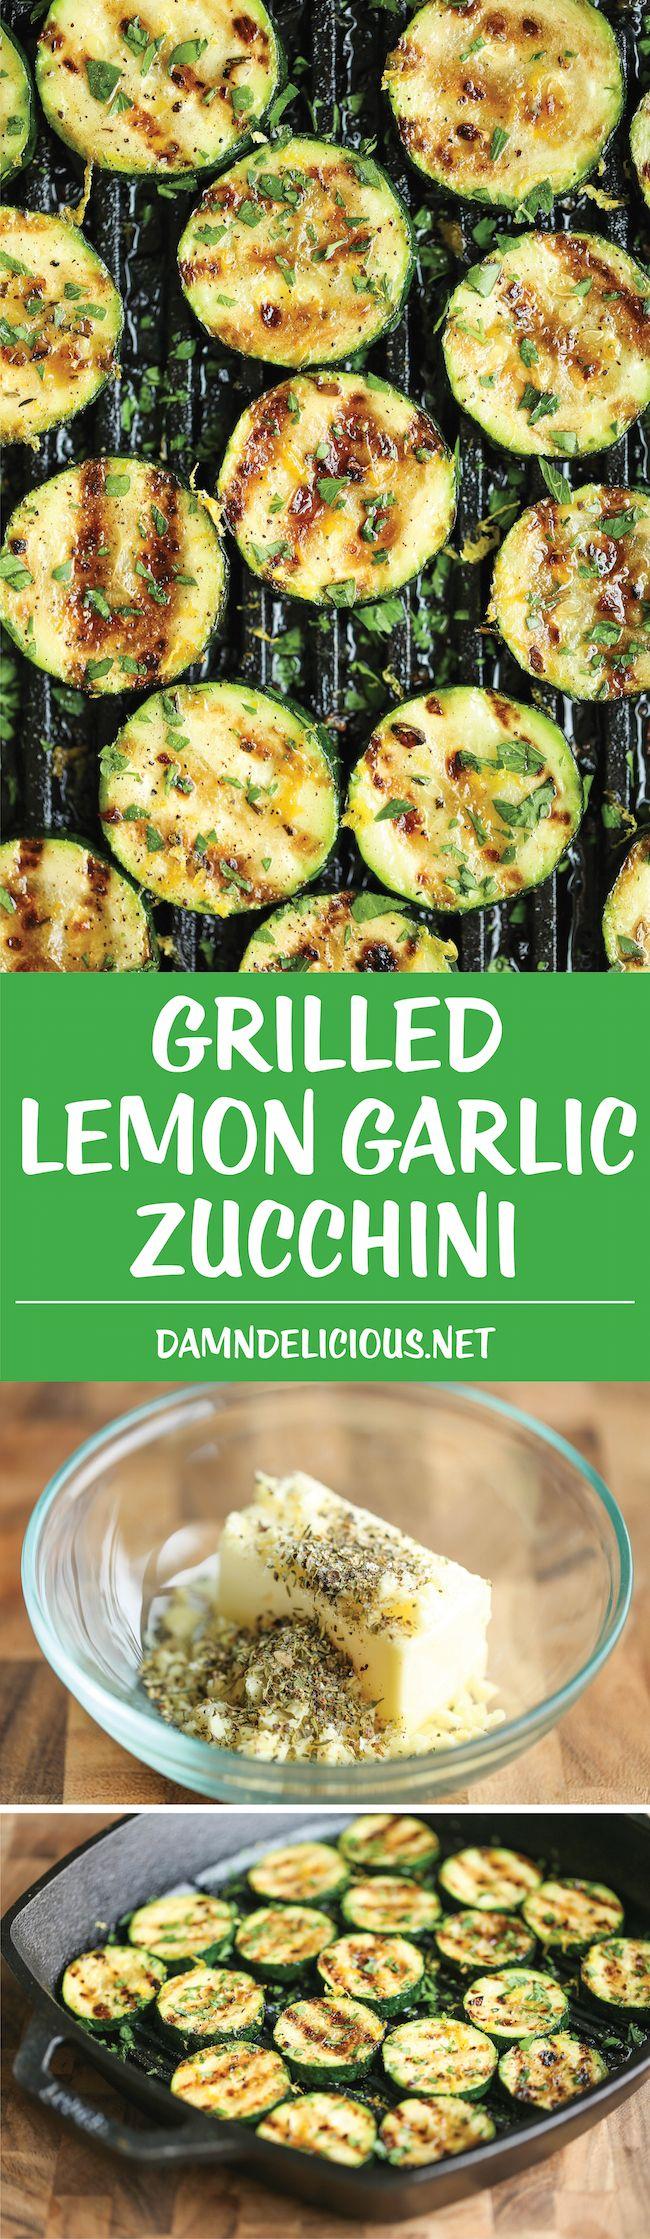 Grilled Lemon Garlic Zucchini